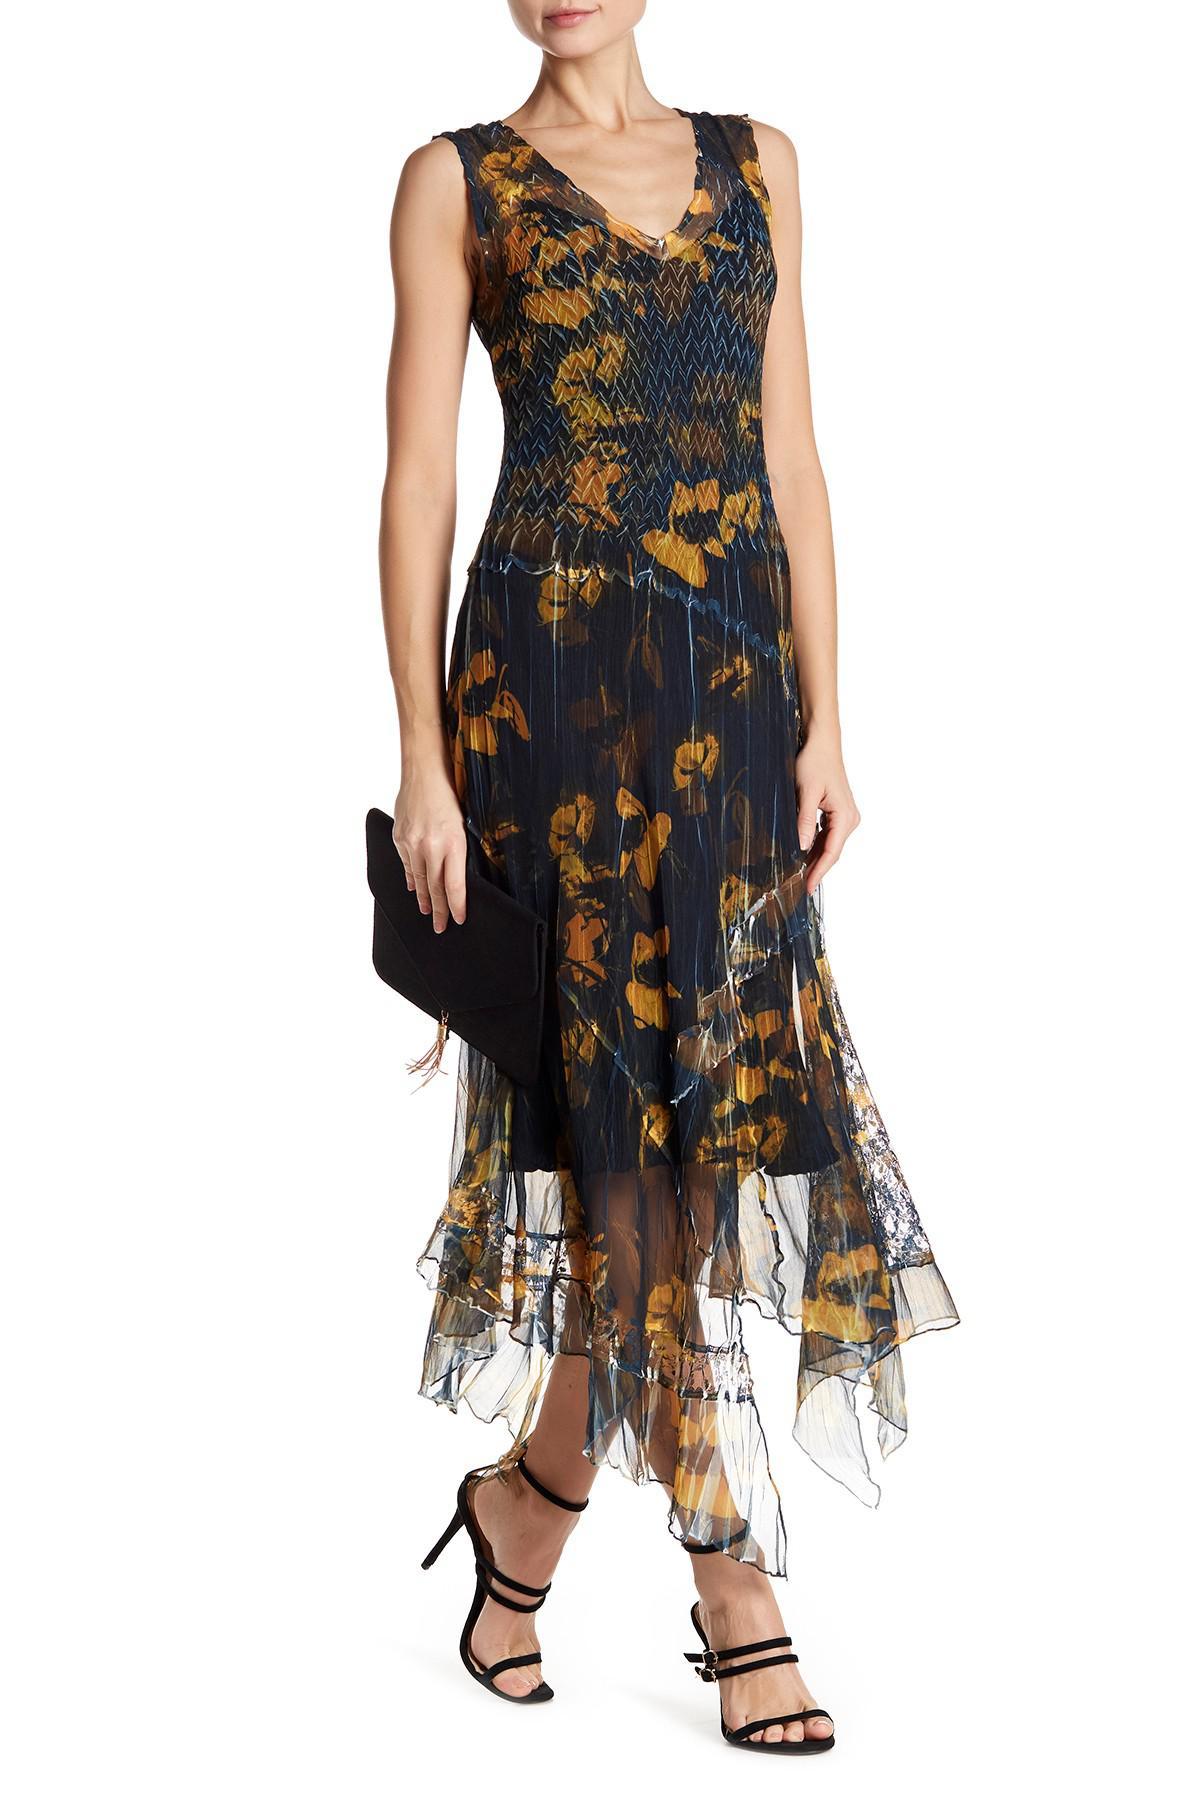 9a14881343 Lyst - Komarov Asymmetrical Hem V-neck Printed Dress in Black